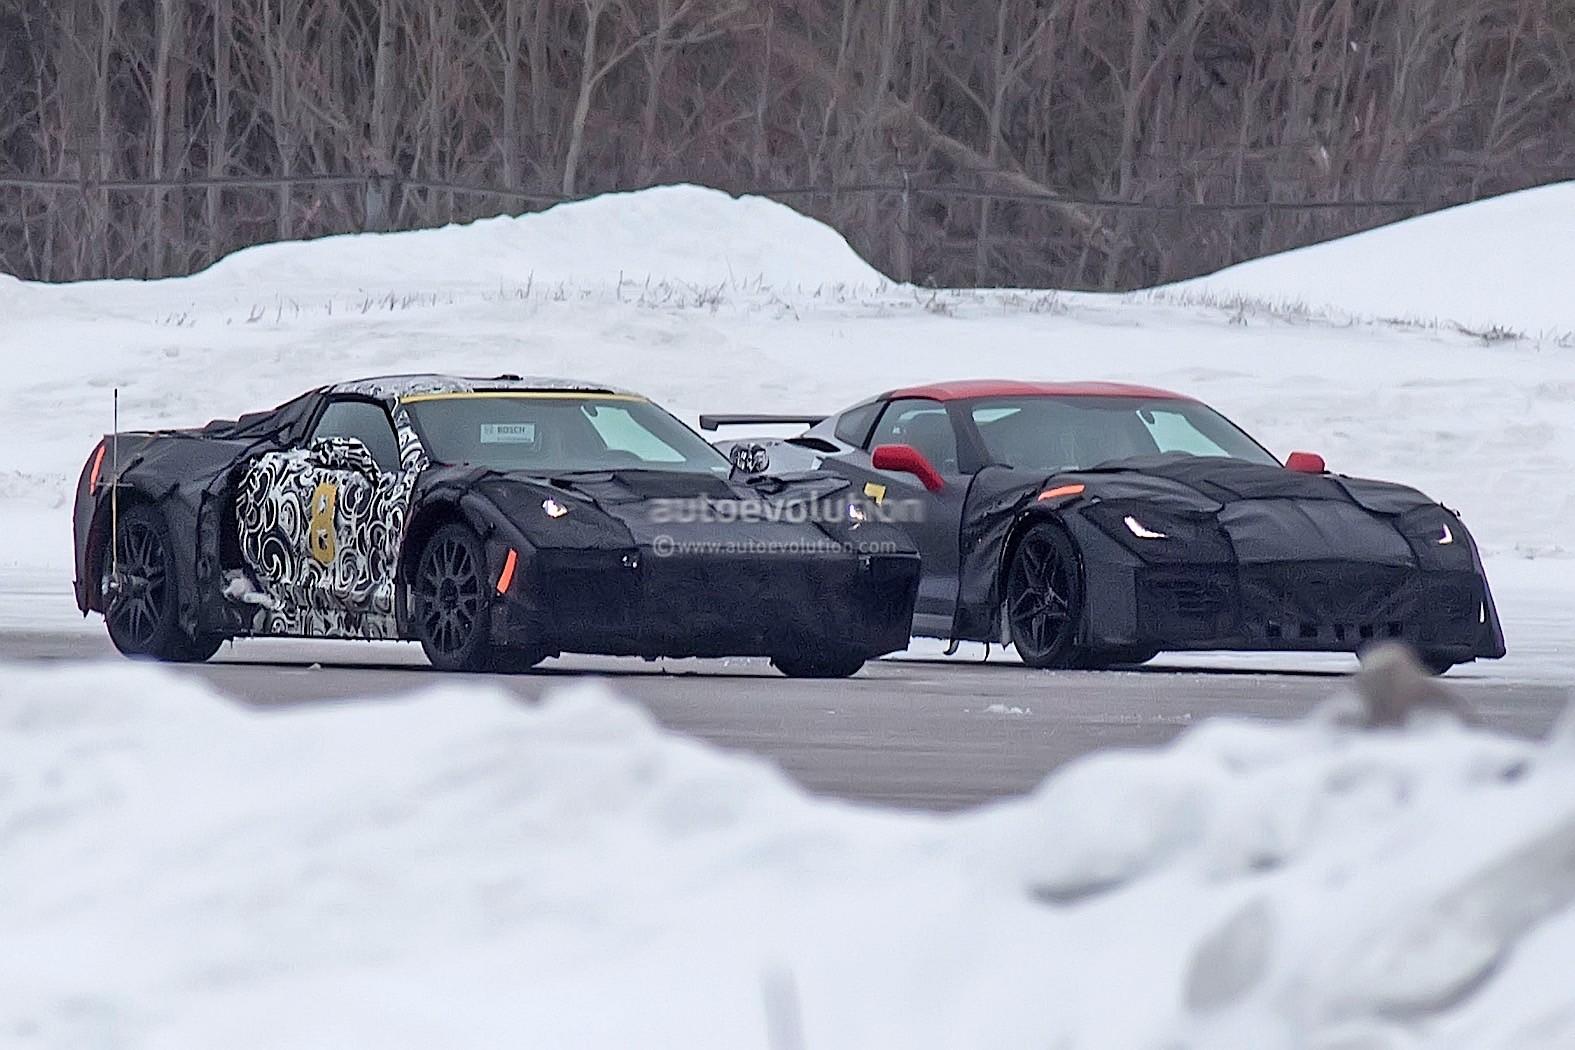 Mid engined 2019 chevrolet corvette c8 to debut at 2018 detroit auto show autoevolution